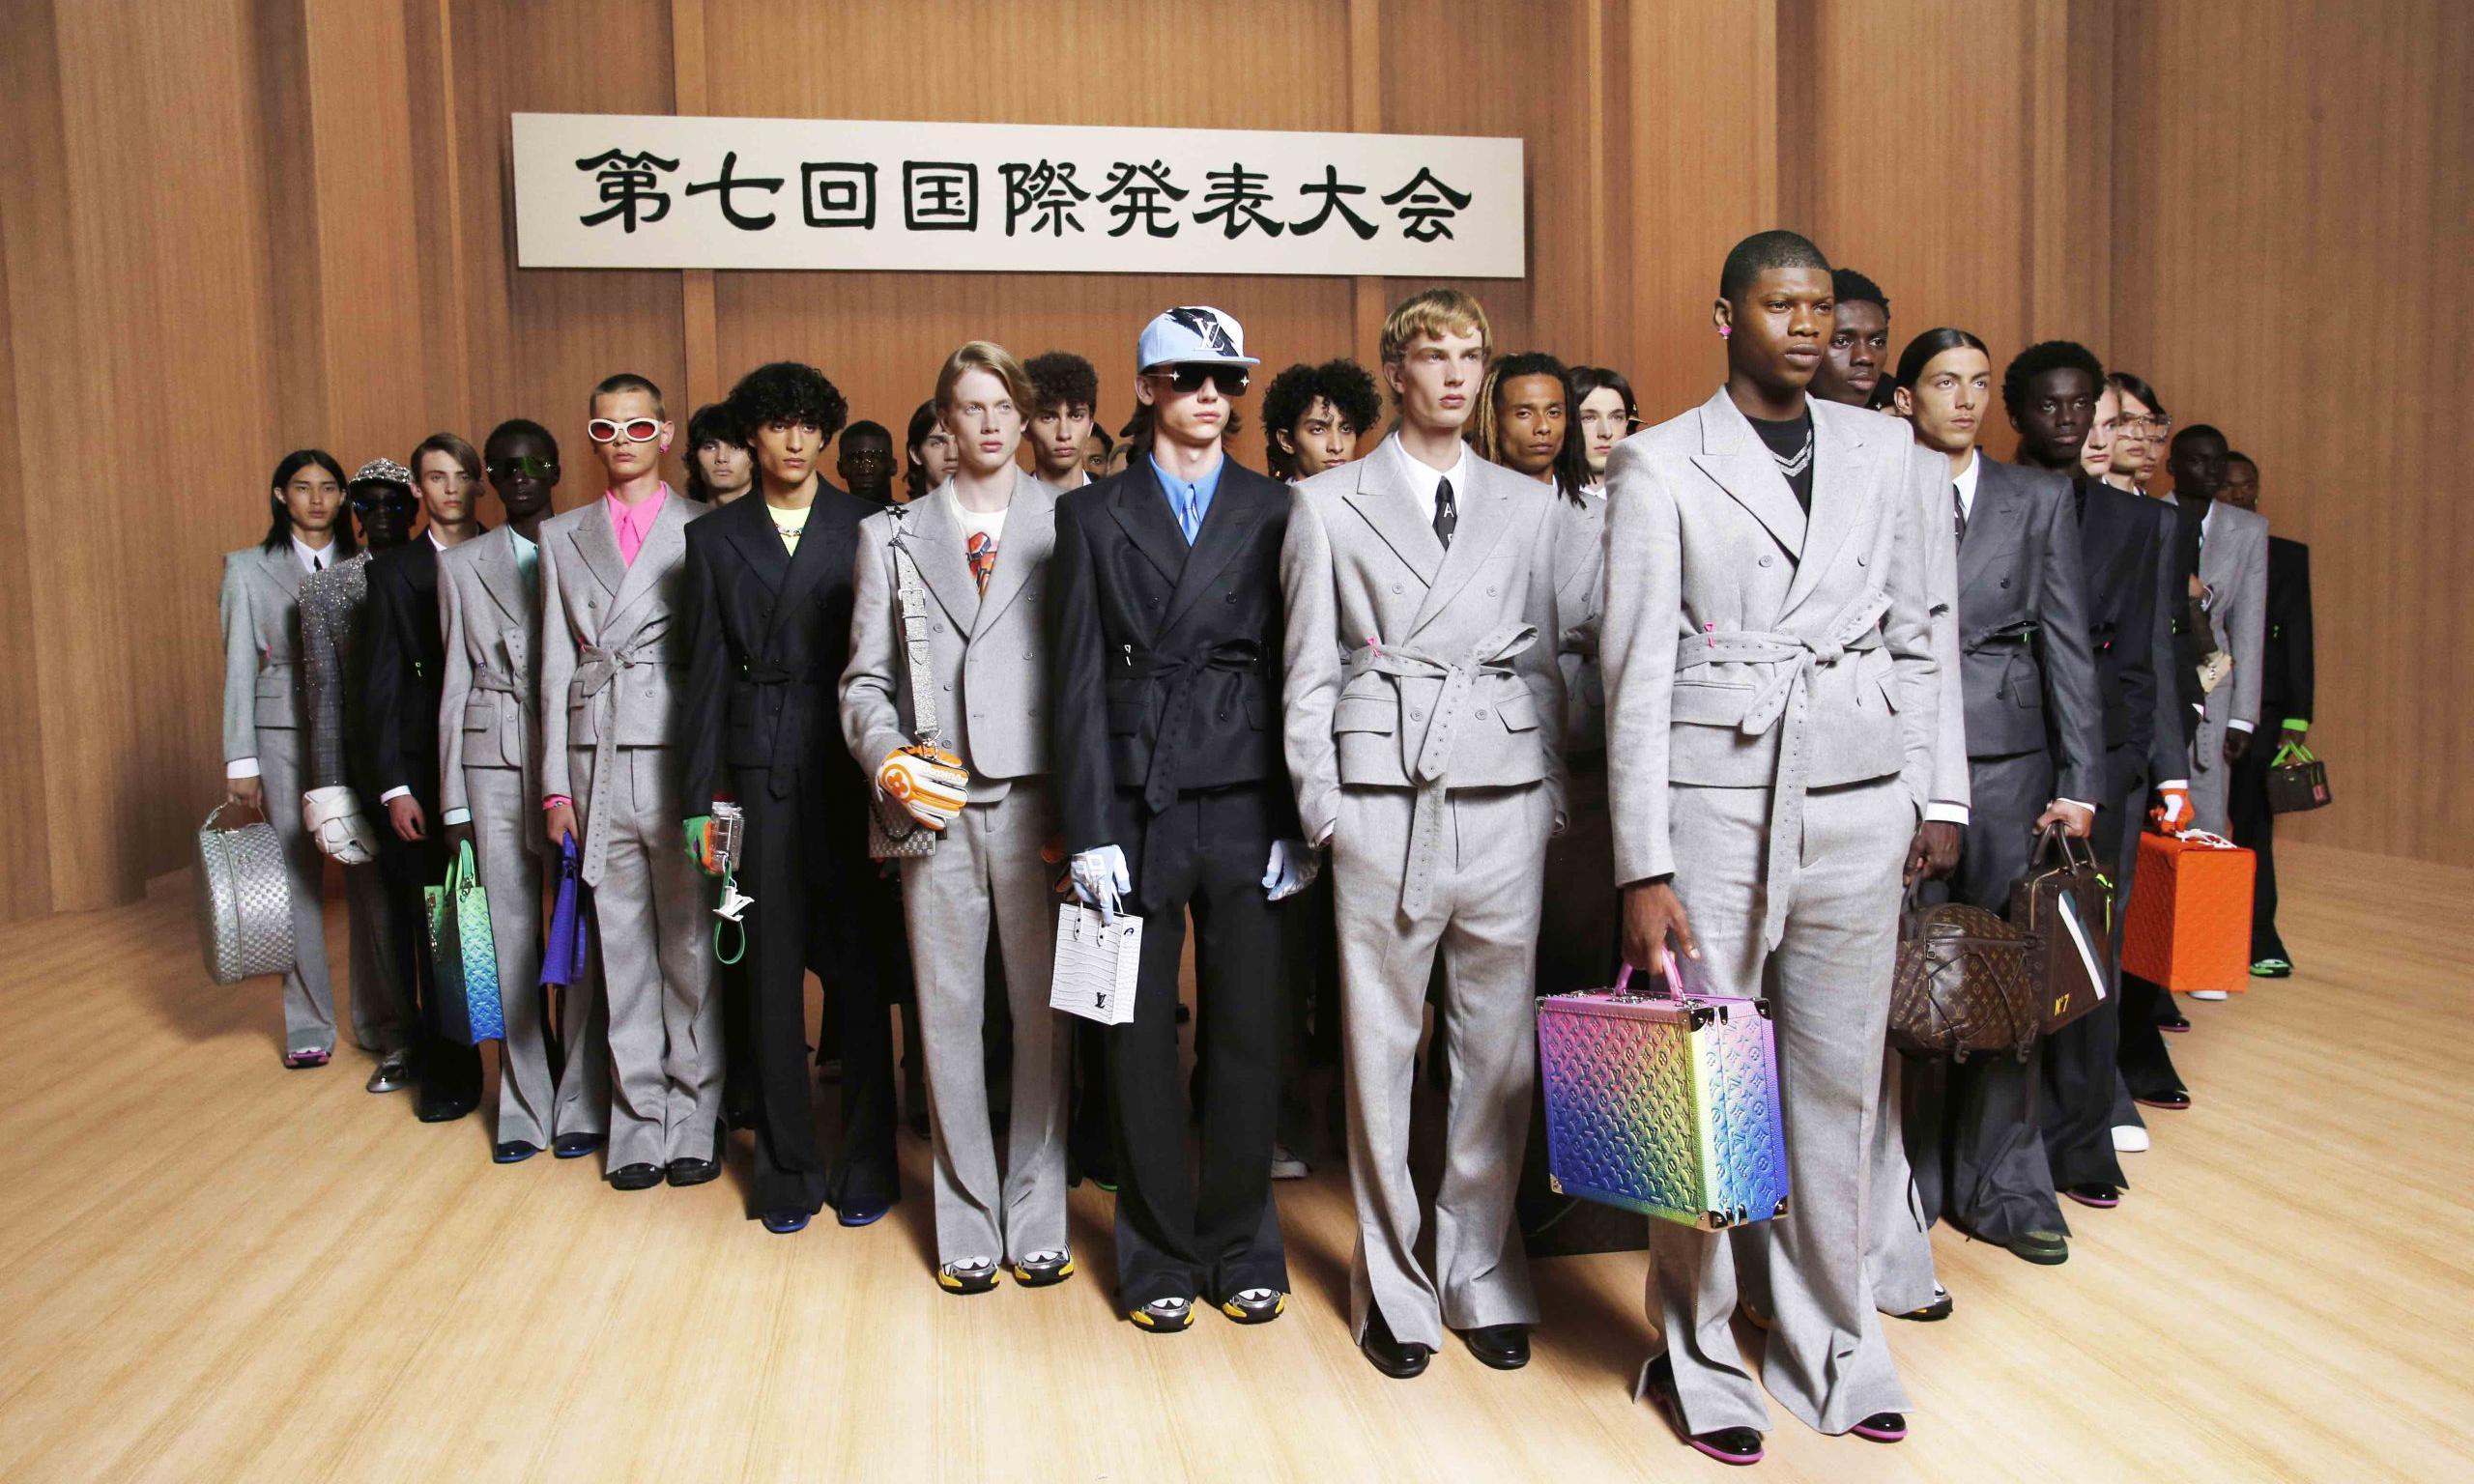 LV 2022 春夏男装展现的「对抗与融合」:Virgil 世界观的新起点